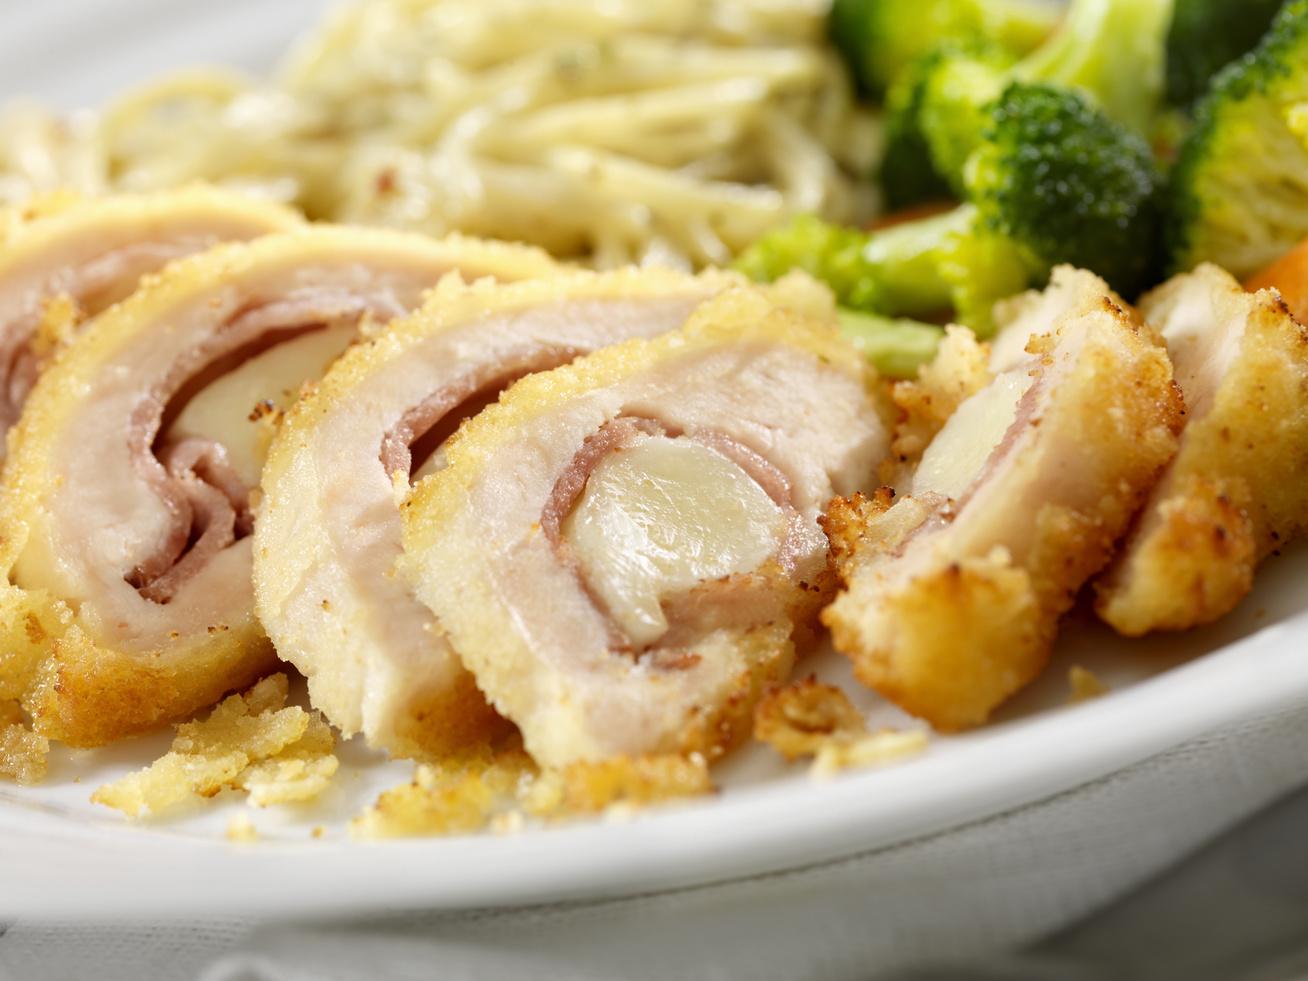 sonkaval-mozzarellaval-toltott-csirkemell